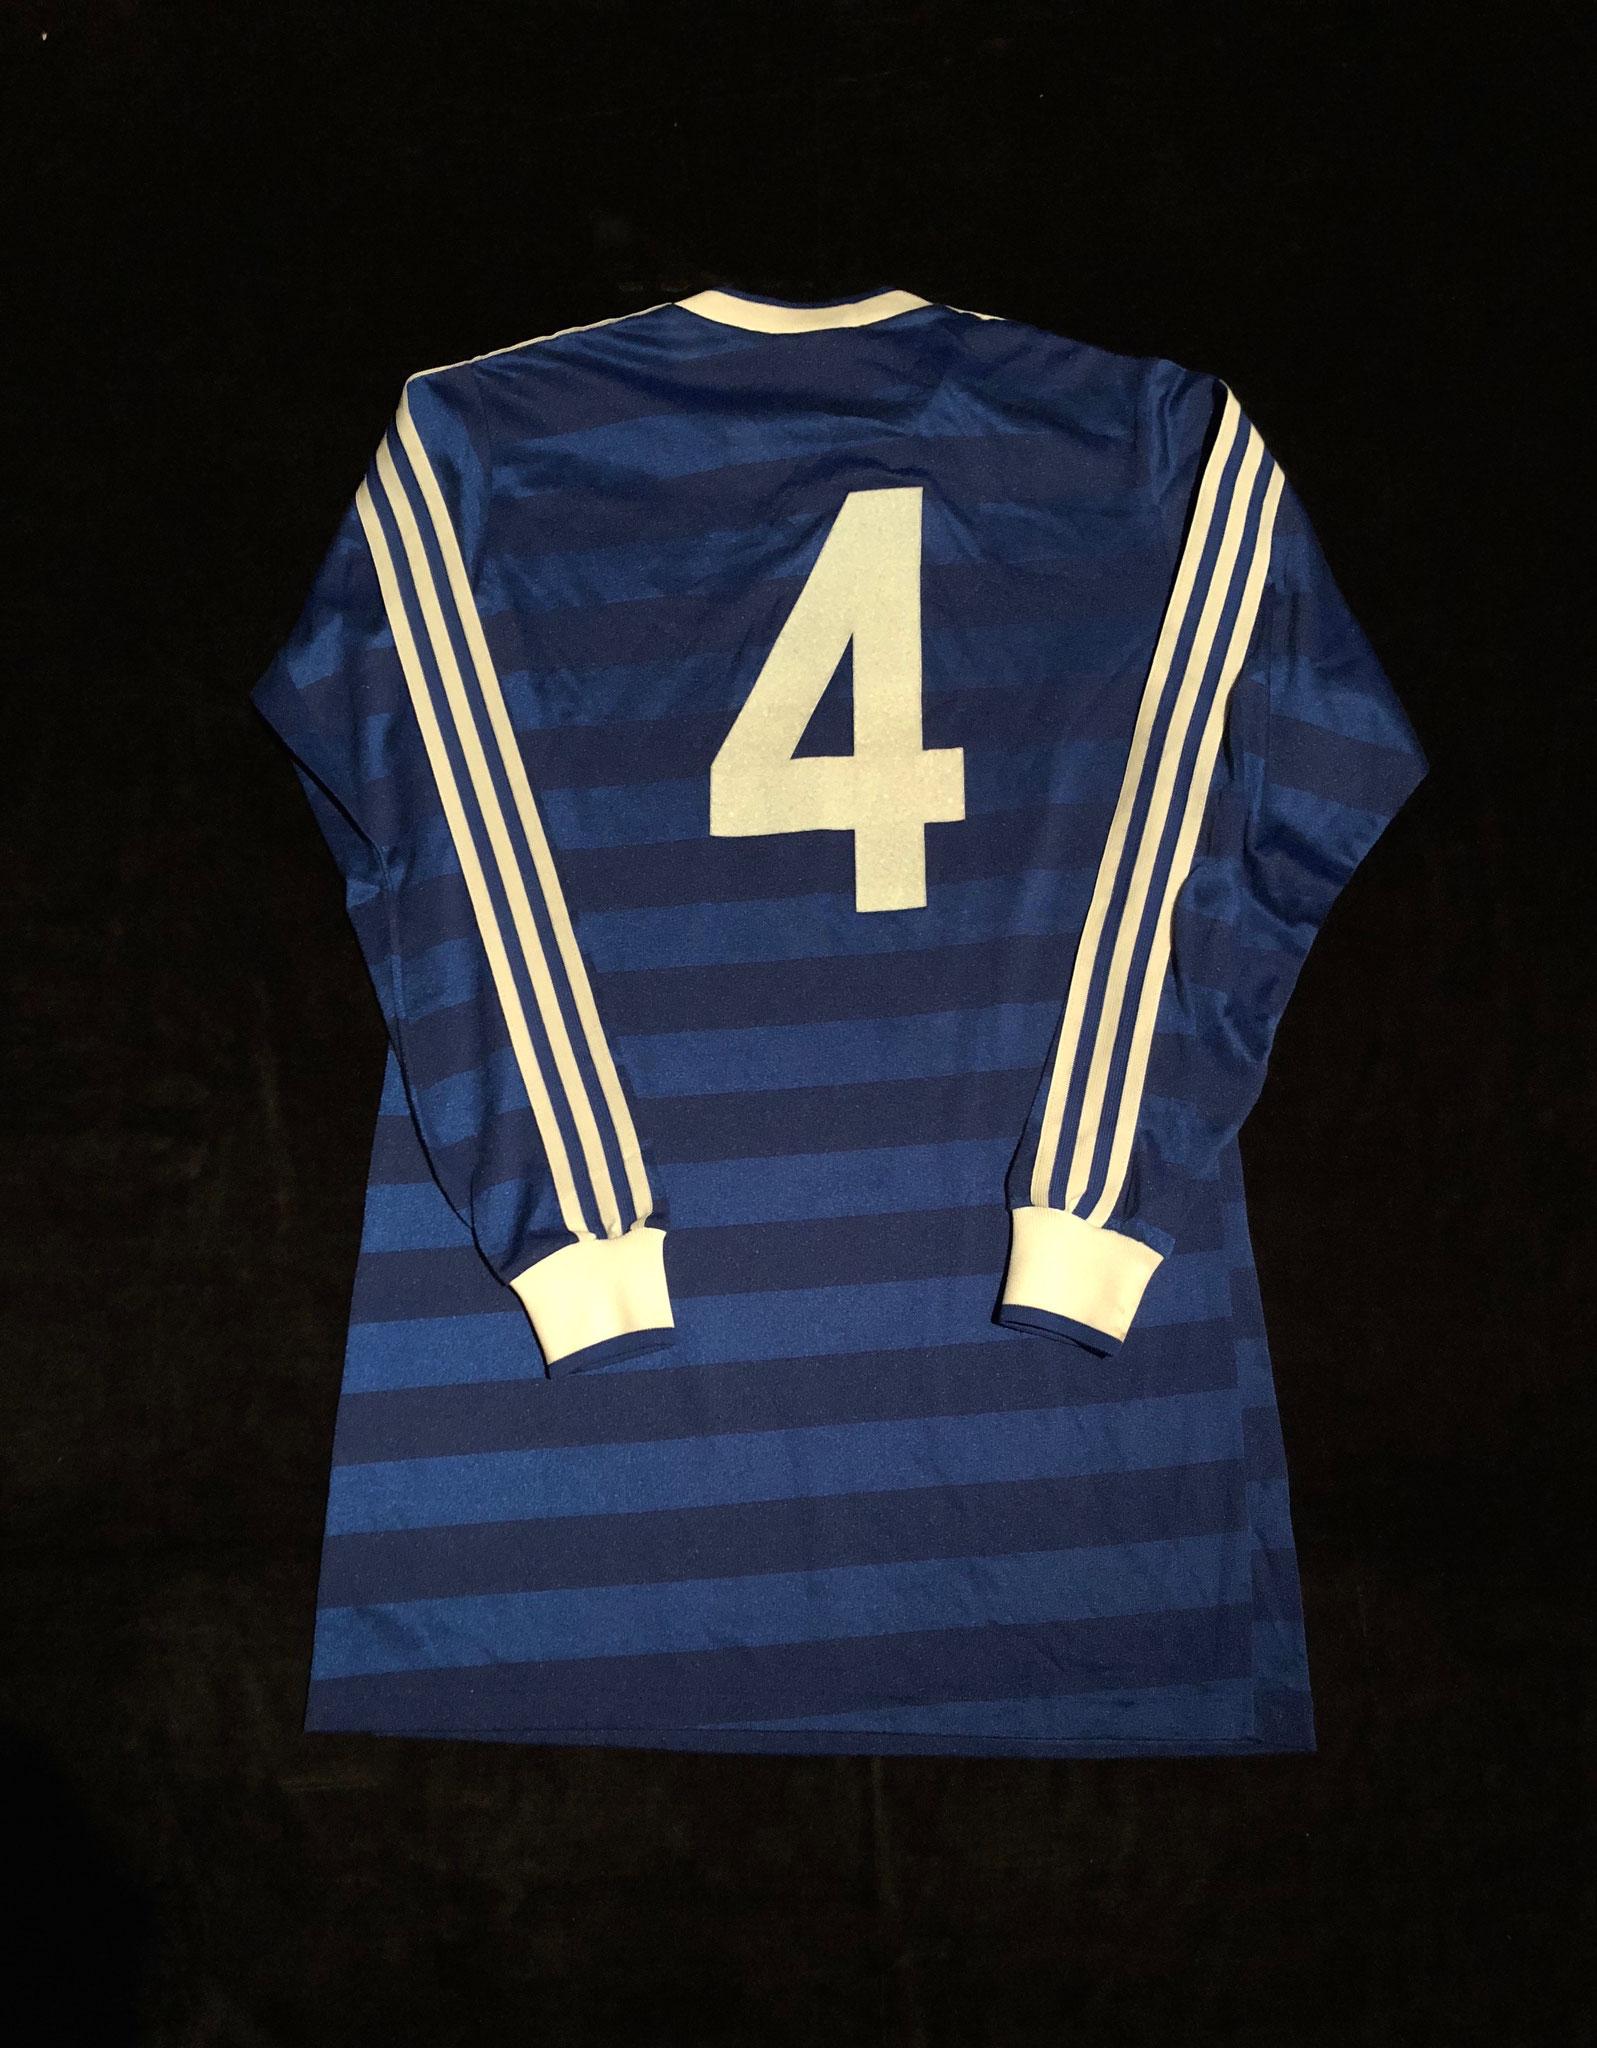 2. Runde 04.11.1987 Ajax Amsterdam - Hamburger SV 2:0 (1:0)